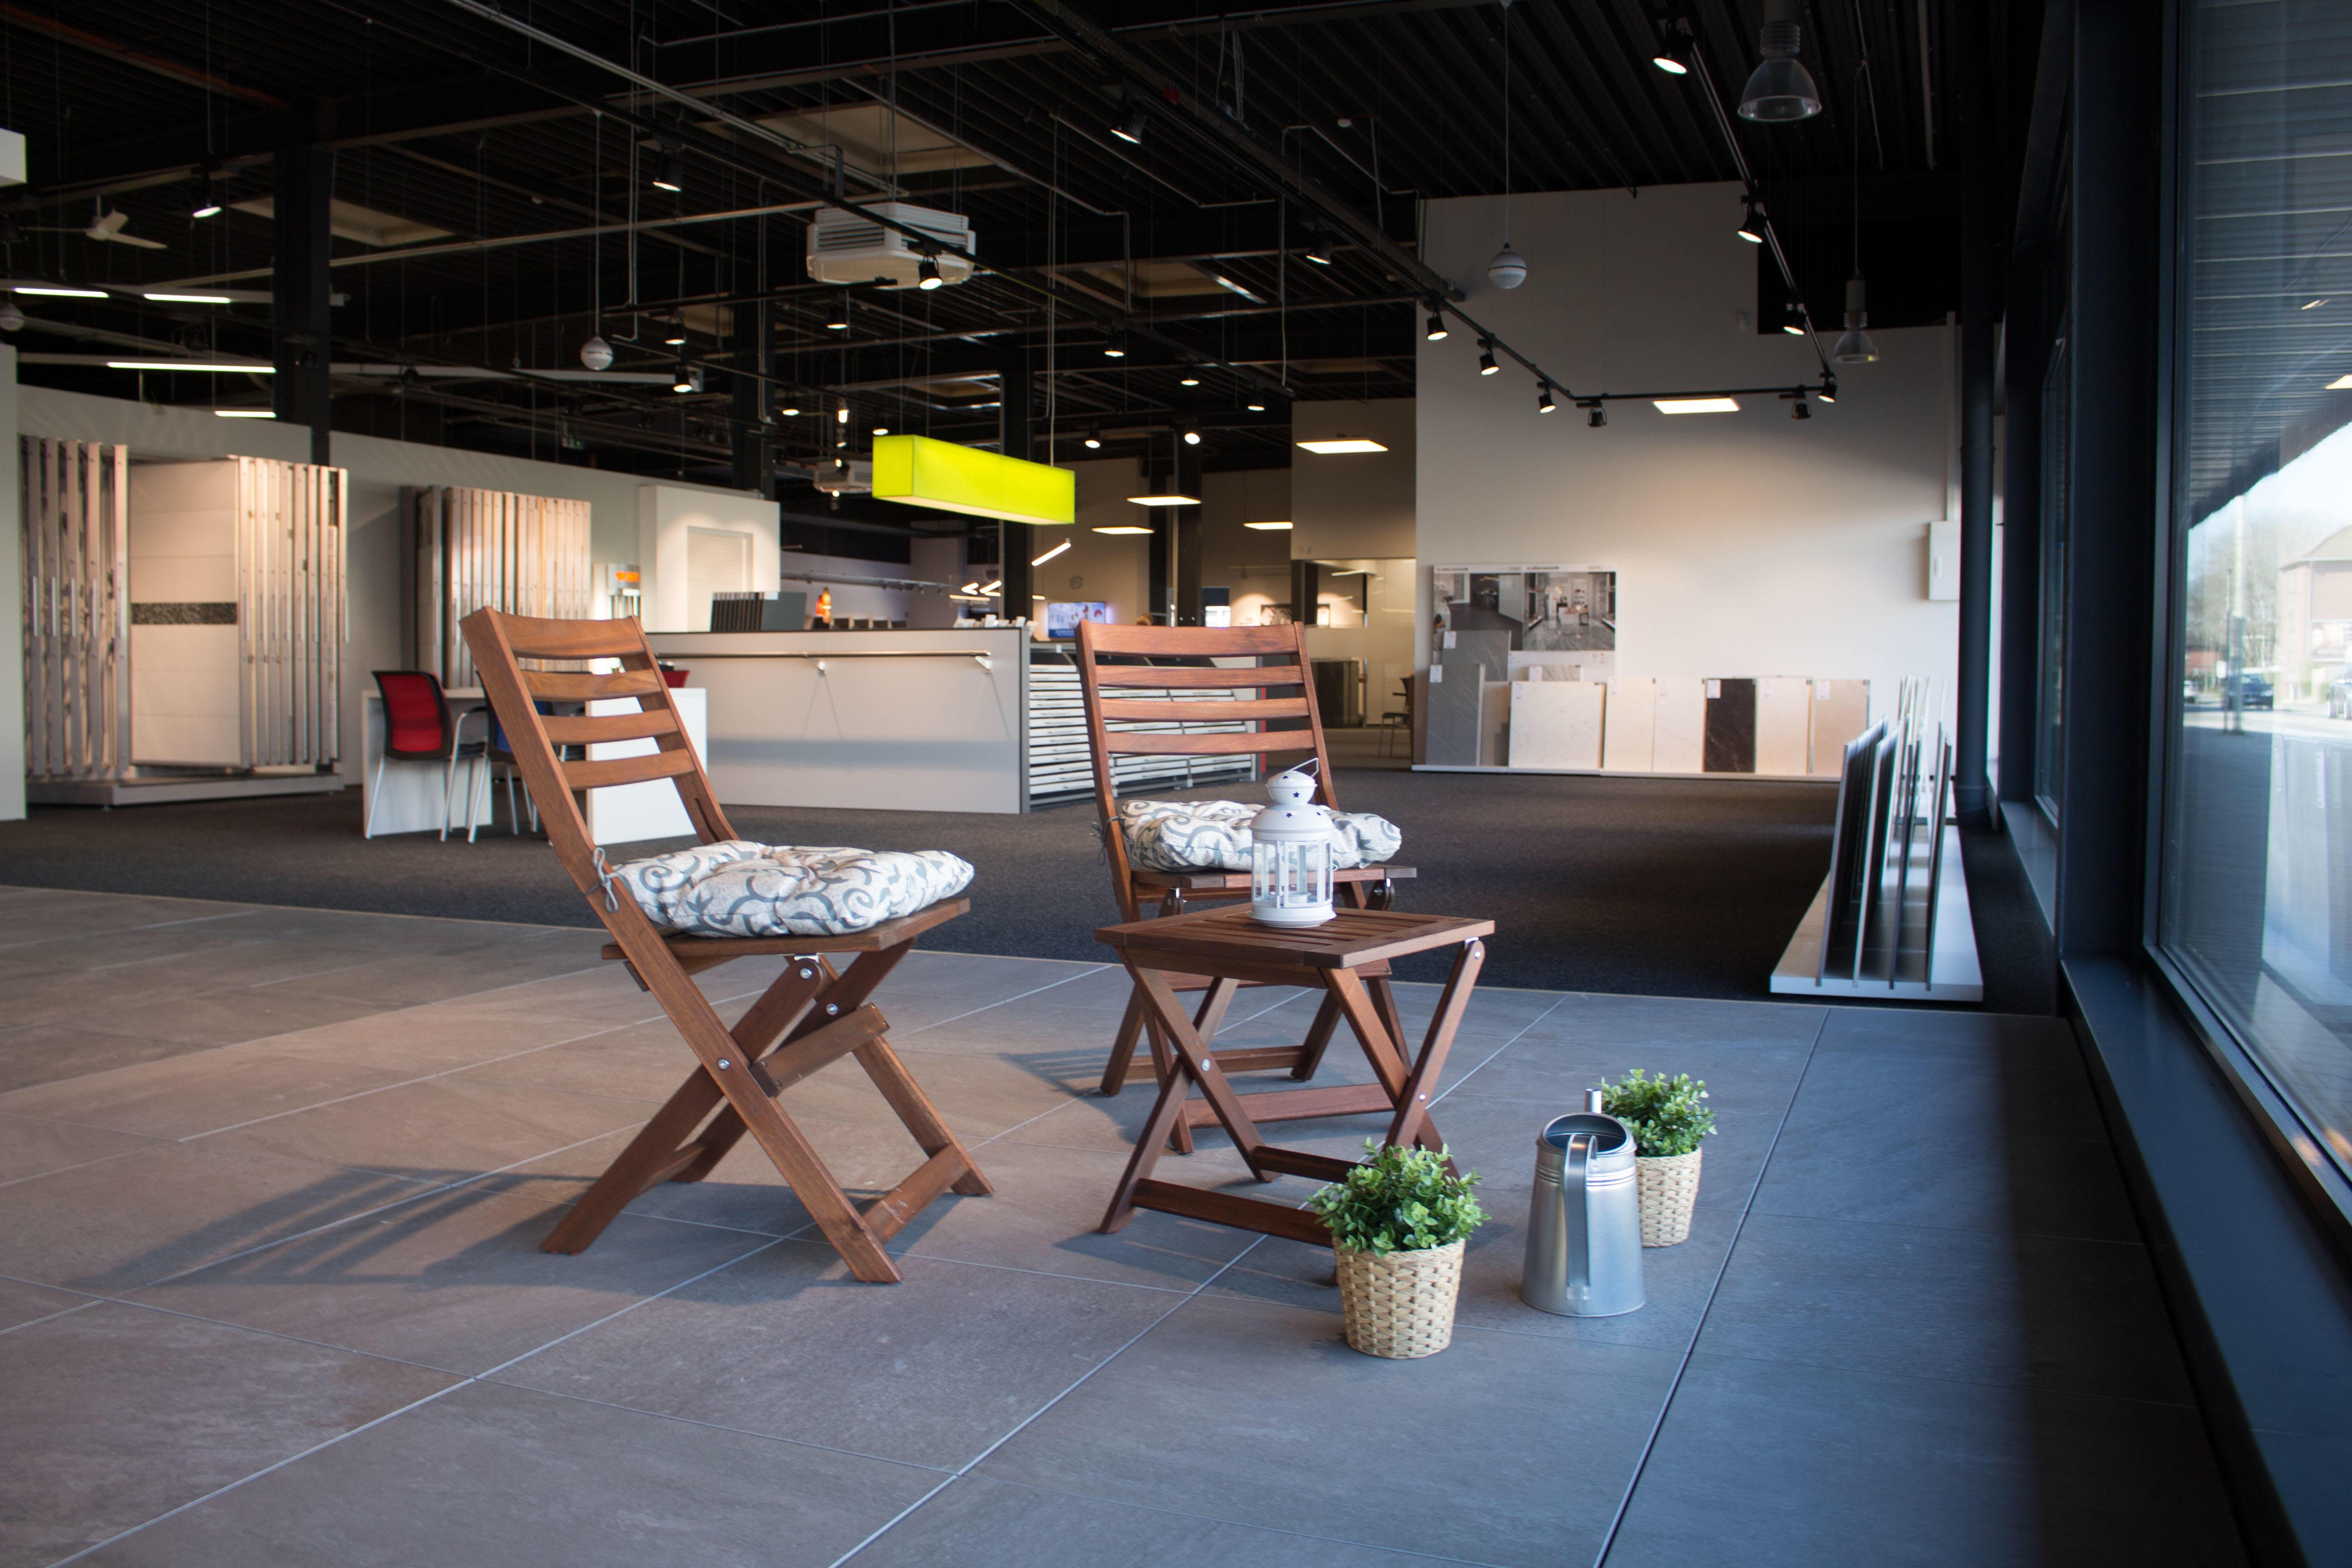 bauen leben team baucenter gmbh co kg ffnungszeiten bauen leben team baucenter gmbh co kg. Black Bedroom Furniture Sets. Home Design Ideas